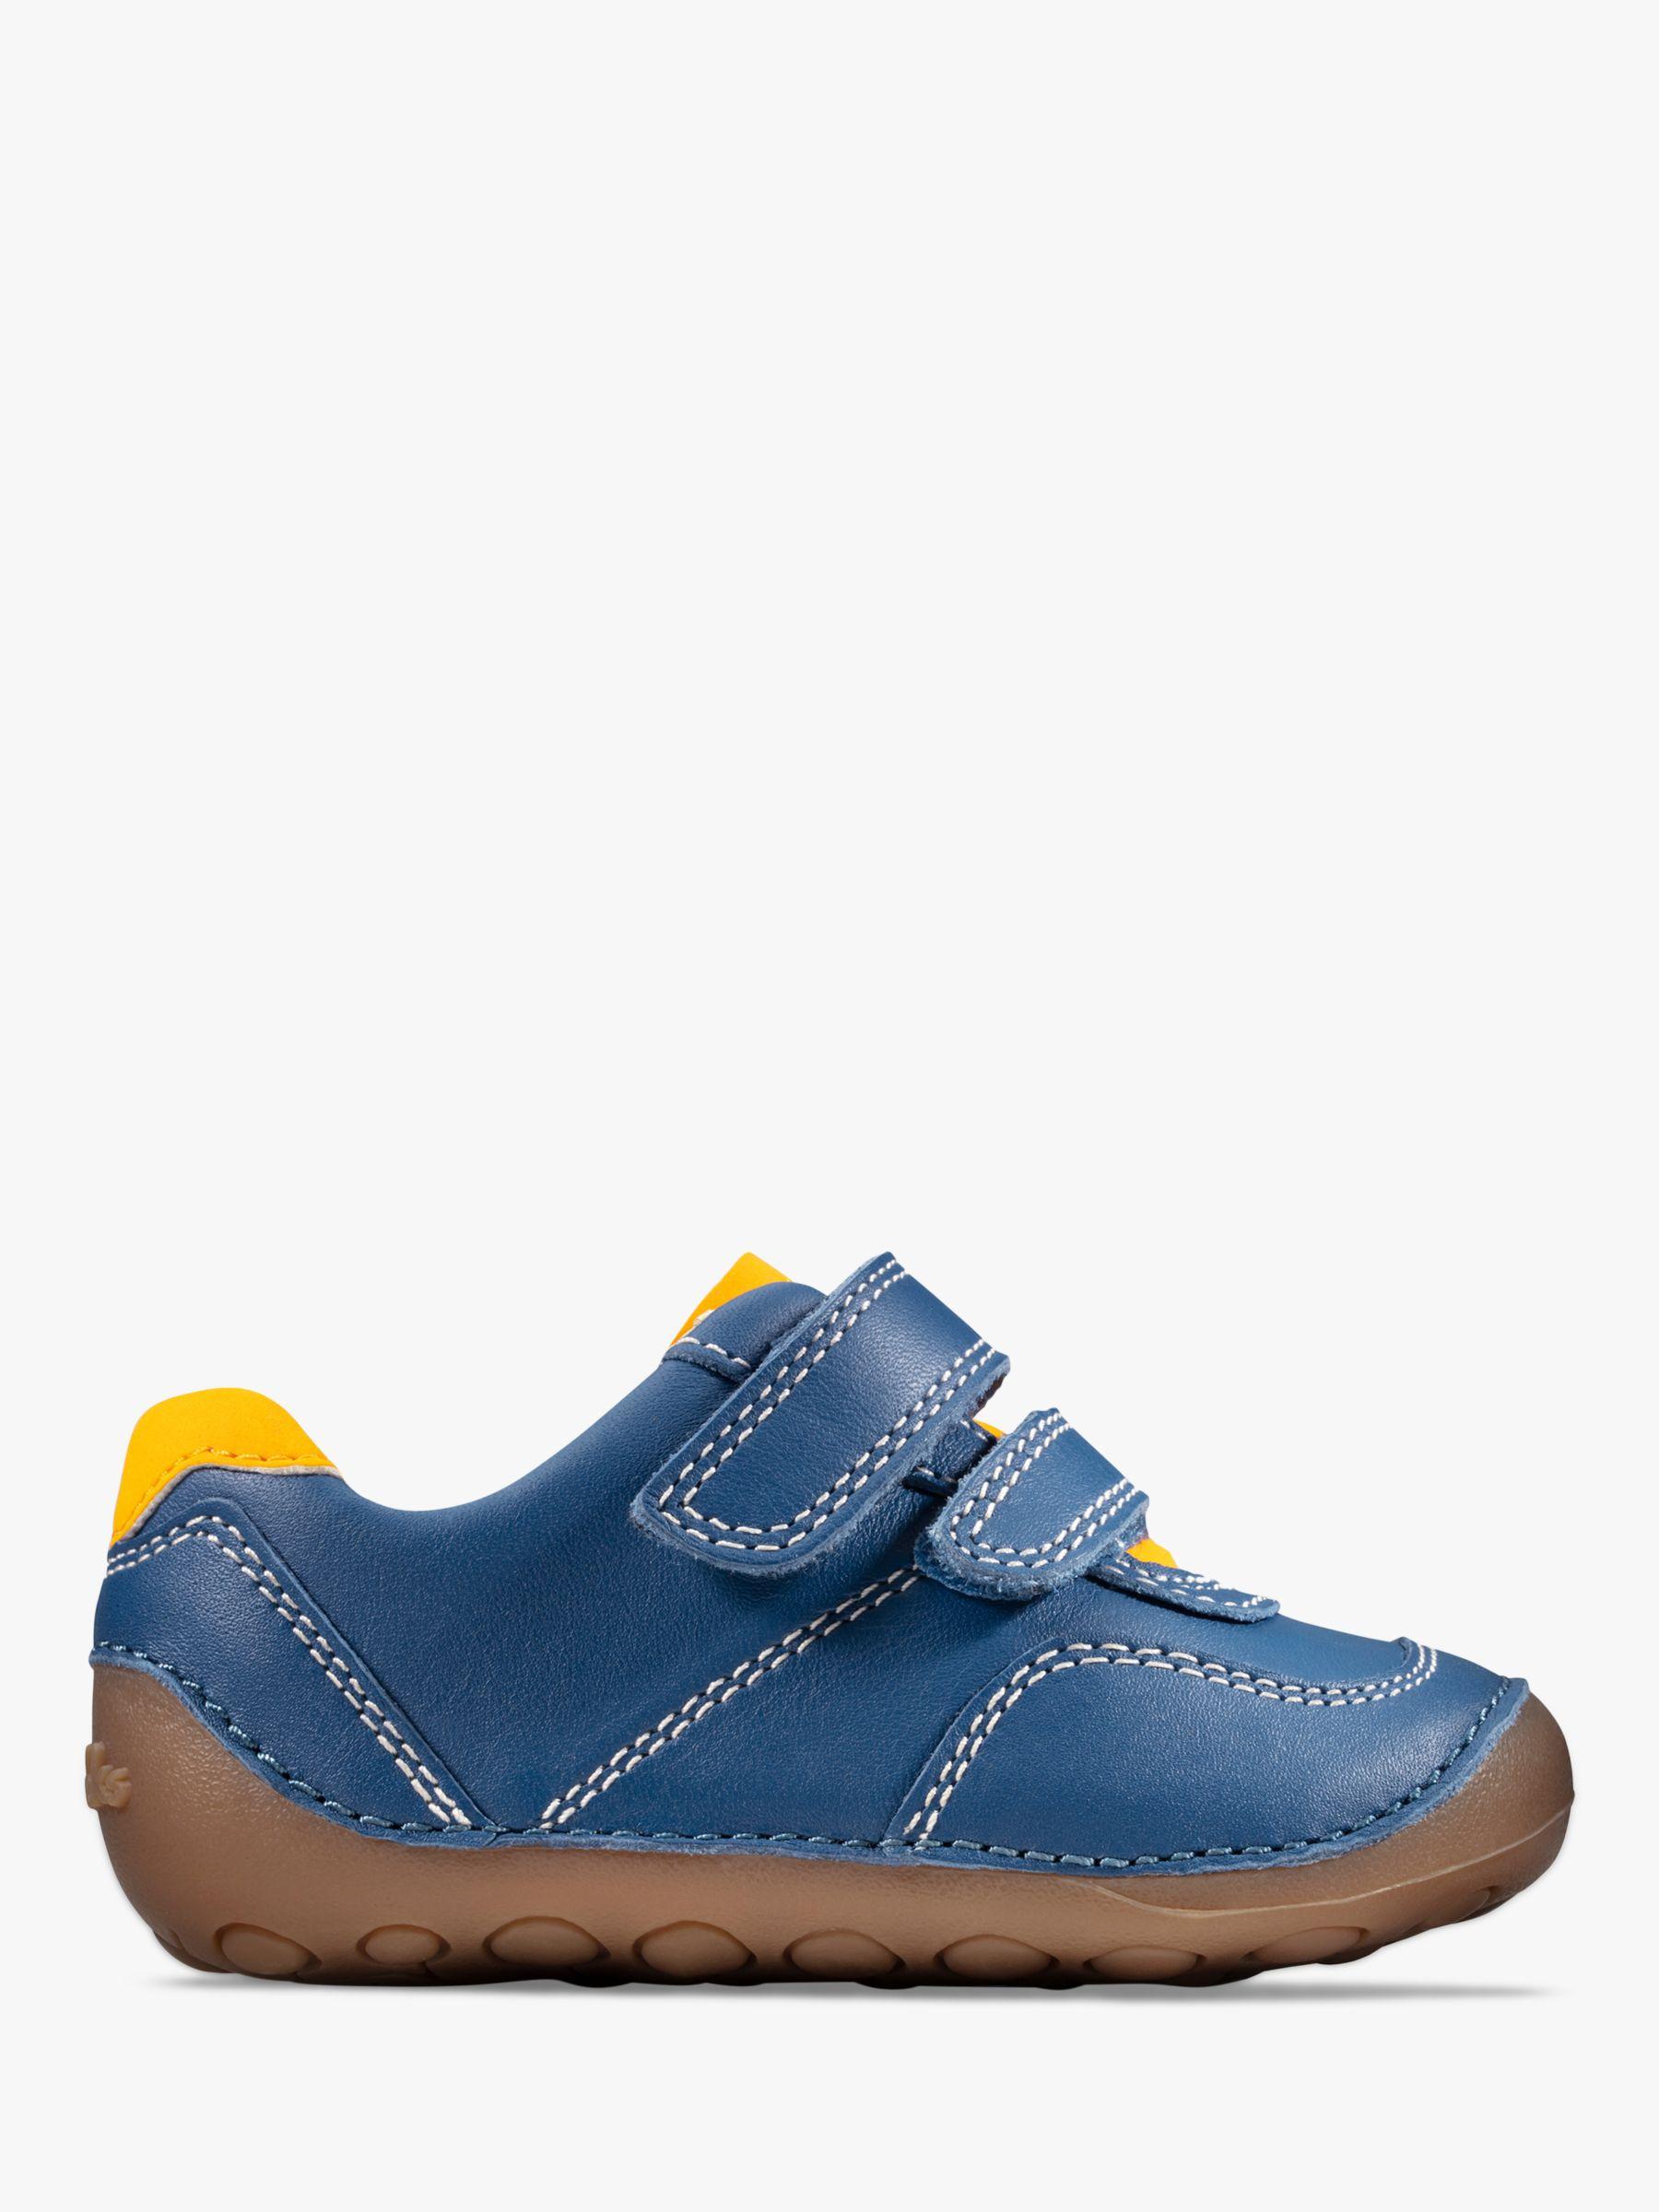 Size 13.5 New Clark Girls Denim Blue Leather Sandals